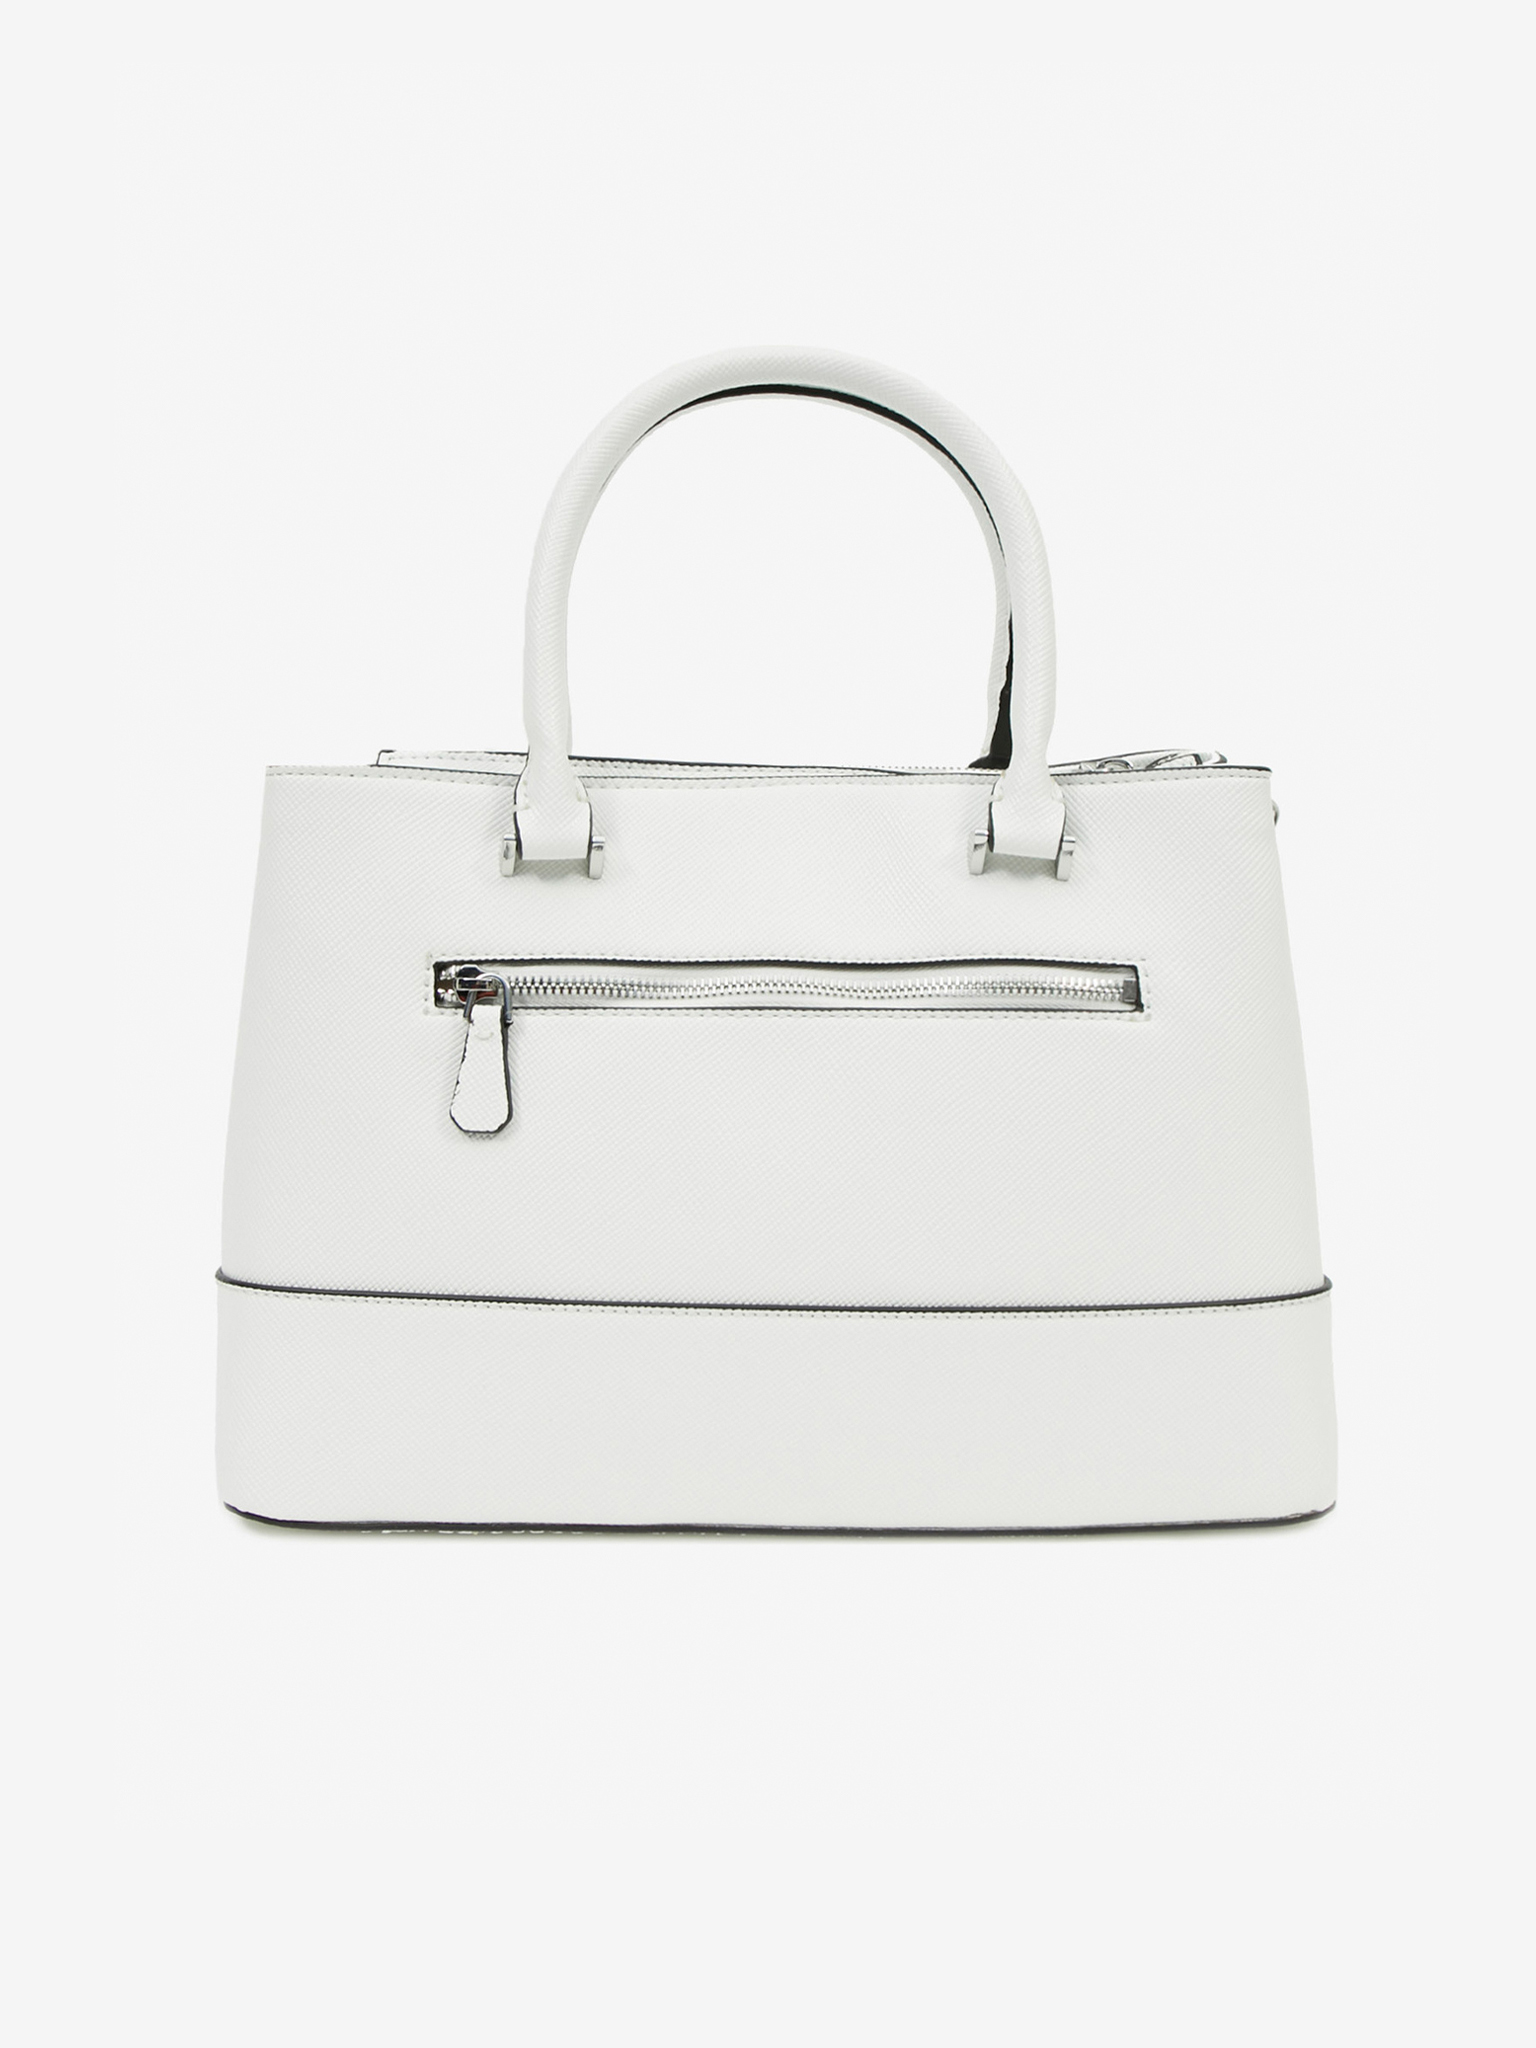 Guess white handbag Cordelia Luxury